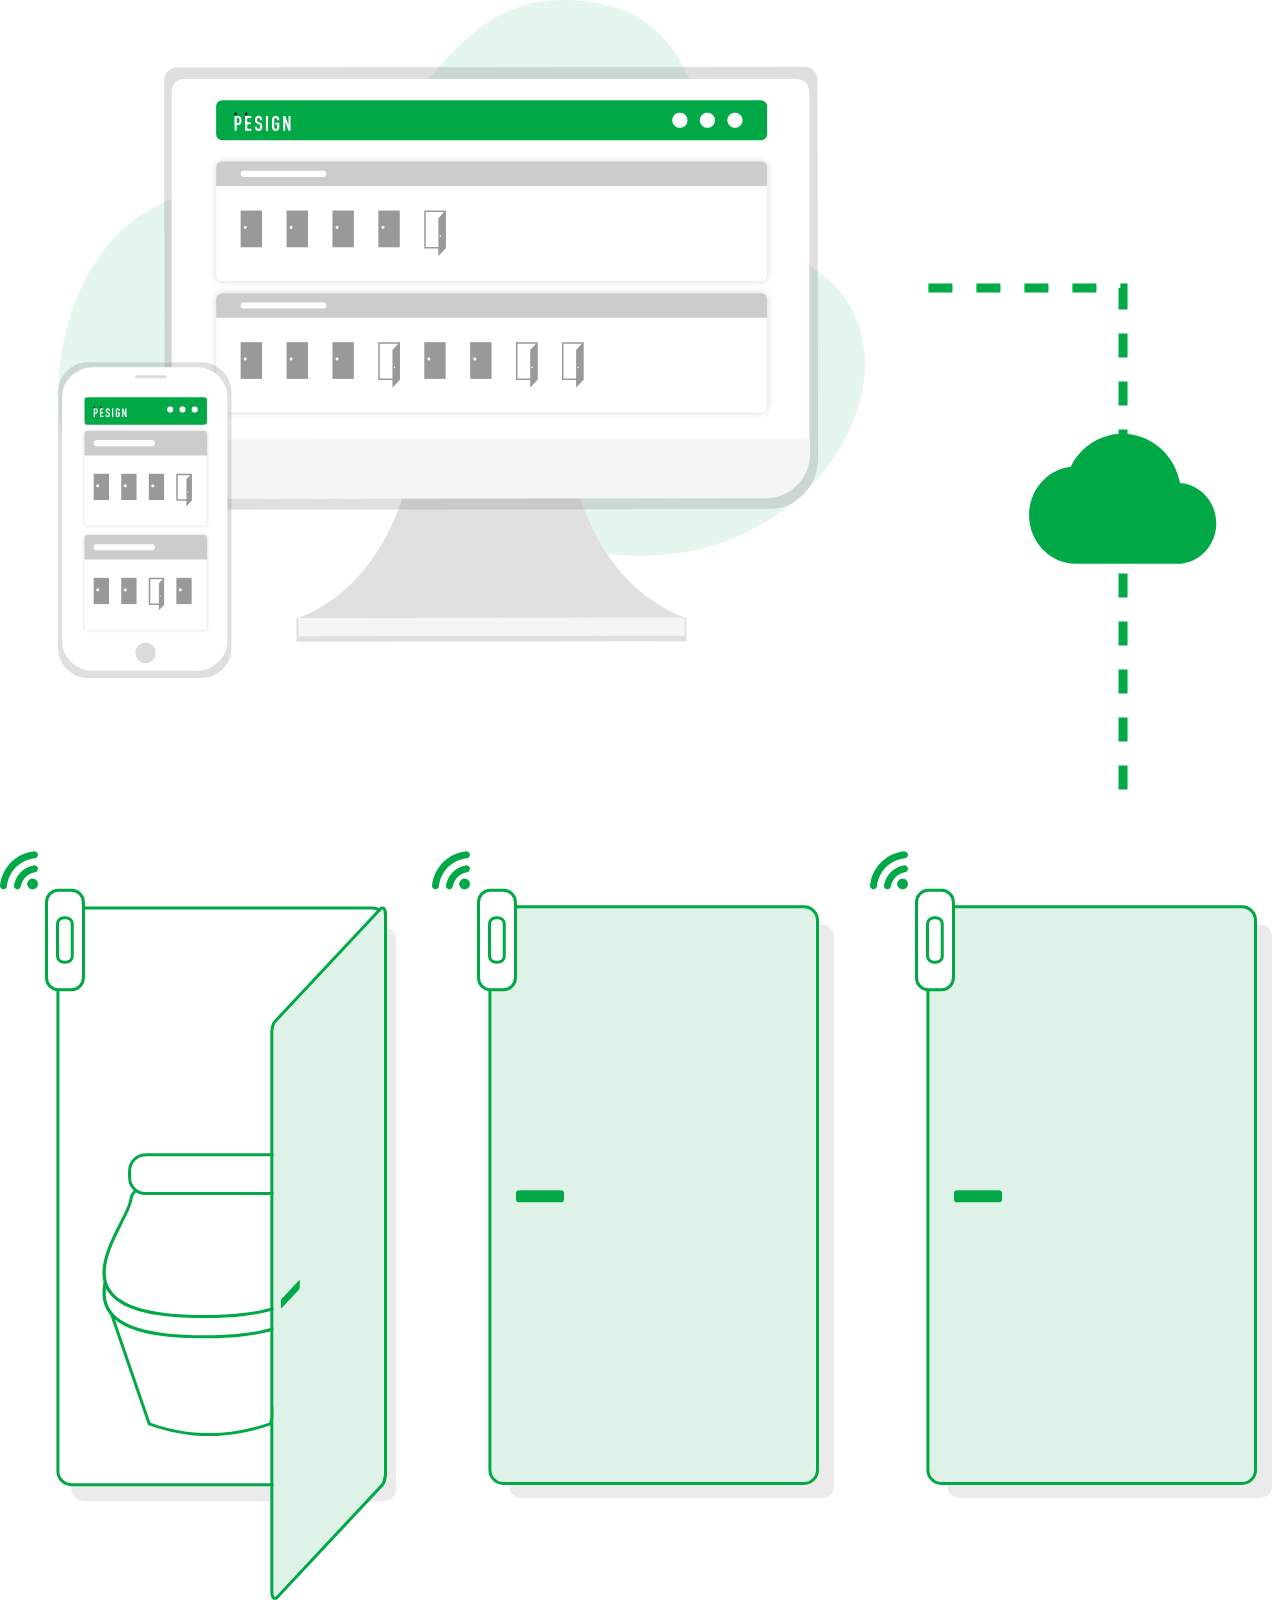 PESIGNによるオフィス環境改善サイクル